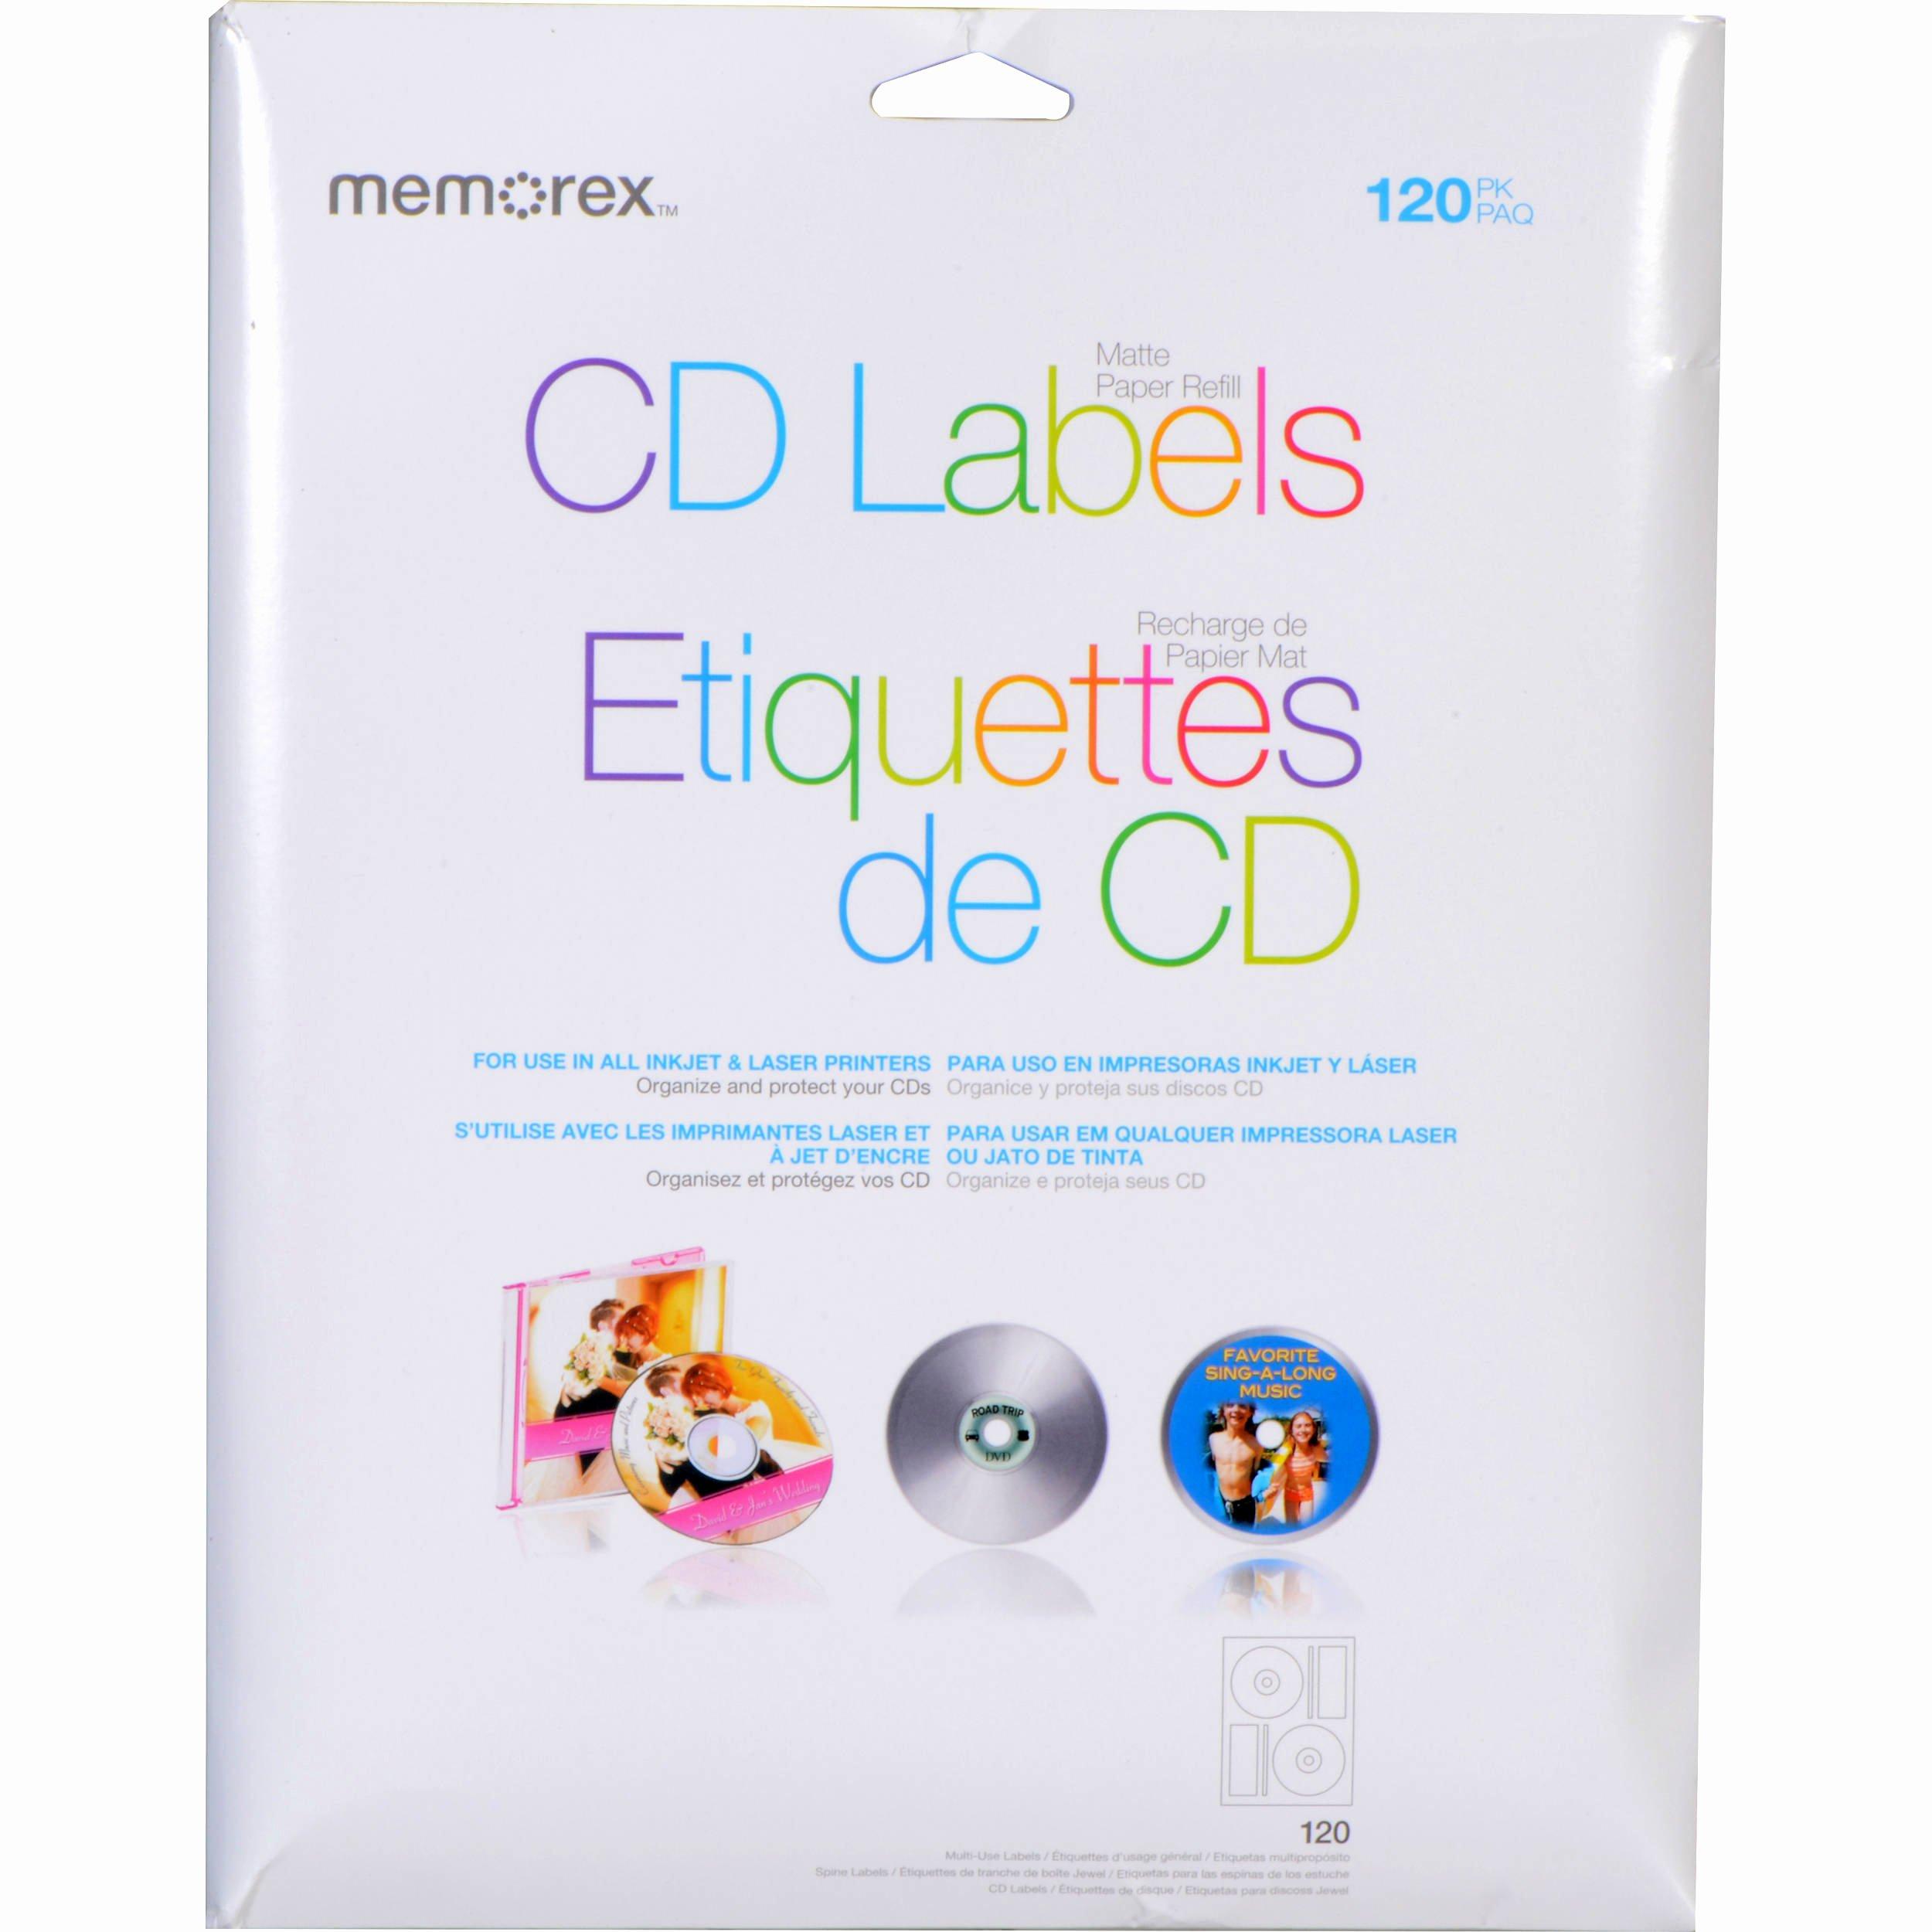 Memorex Cd Labels Template Word Lovely Blog Archives Programsbackuper